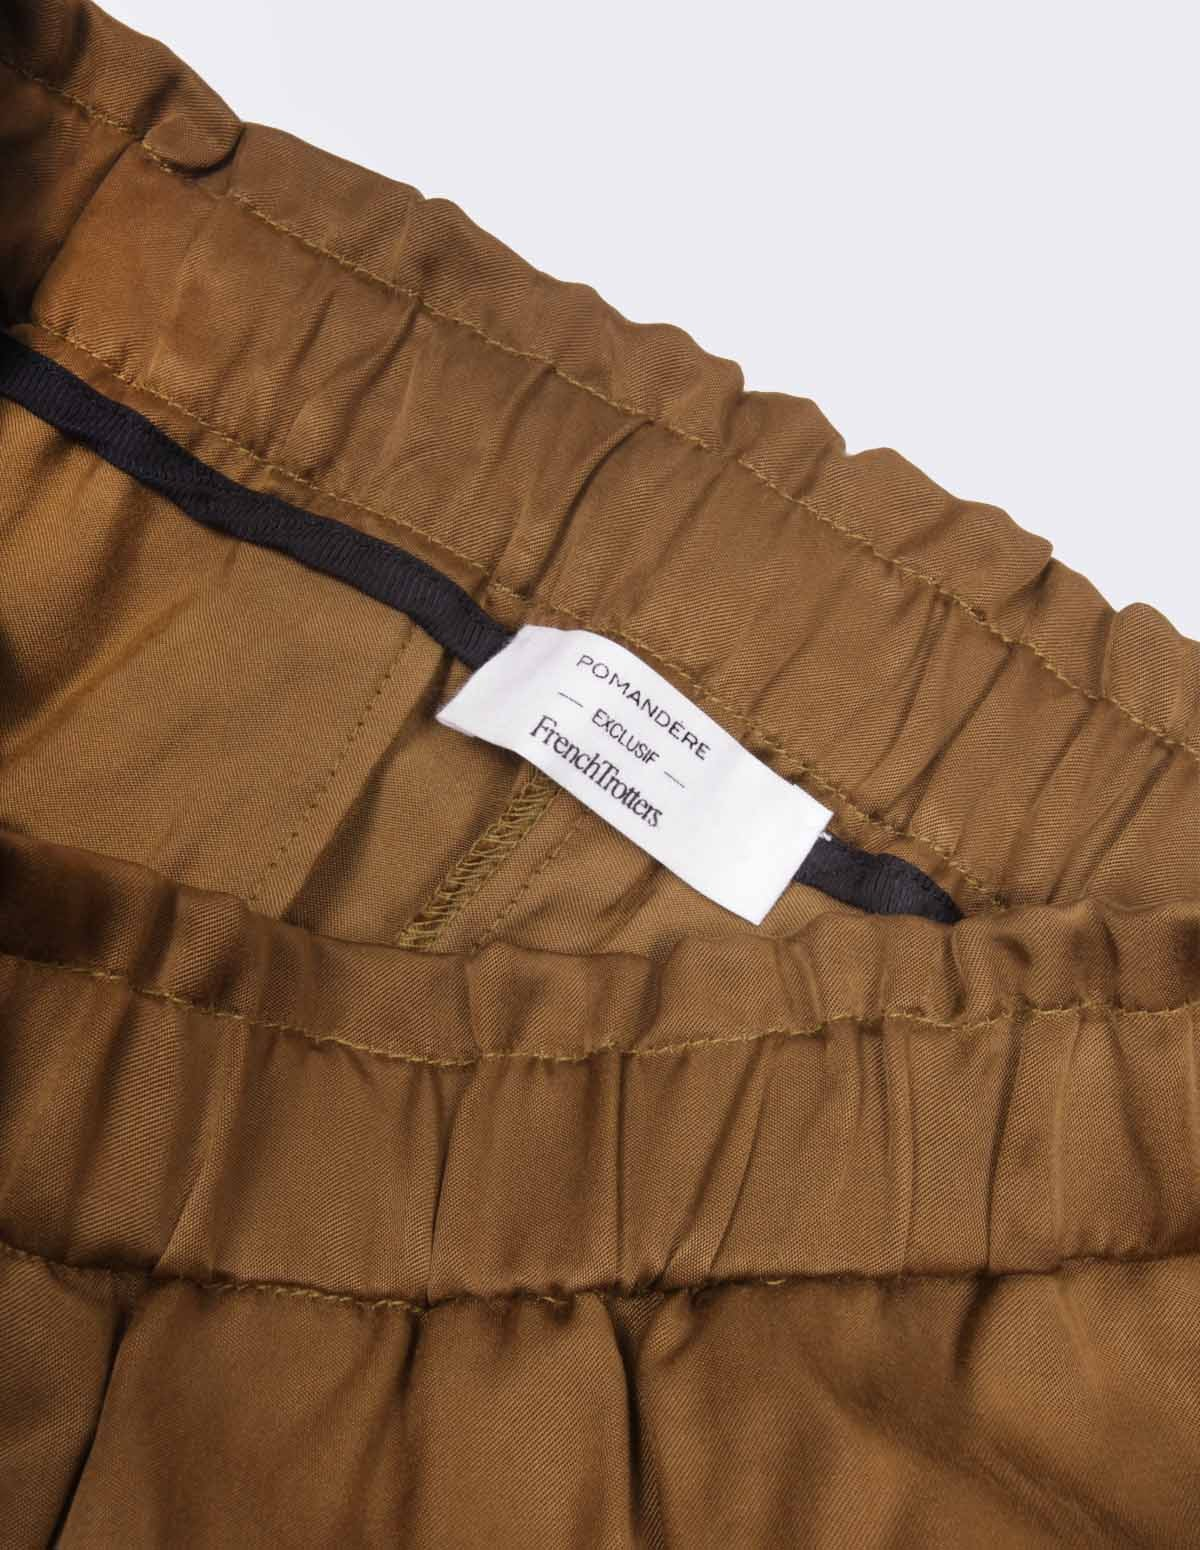 Pom 7123/20657 Exclu Pants